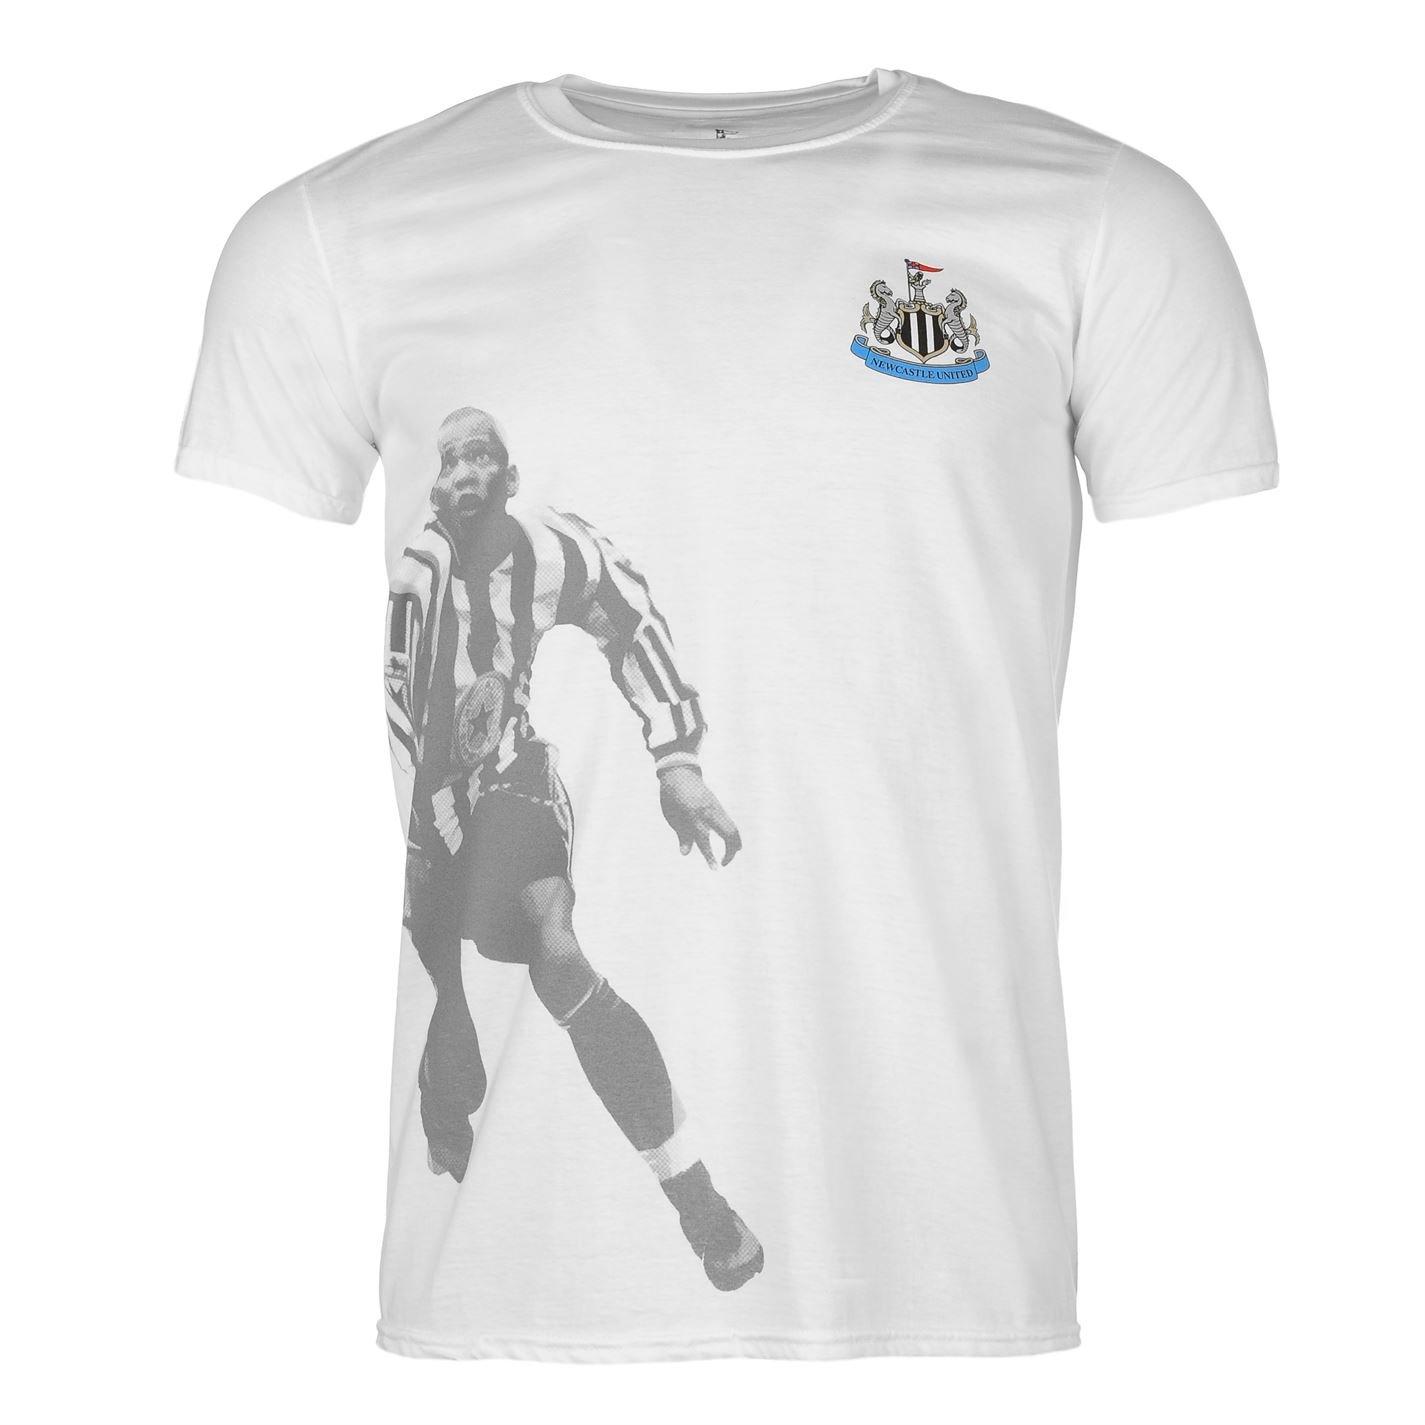 Team Hombre Newcastle United Retro Player Camiseta Hombre Top Ropa ...